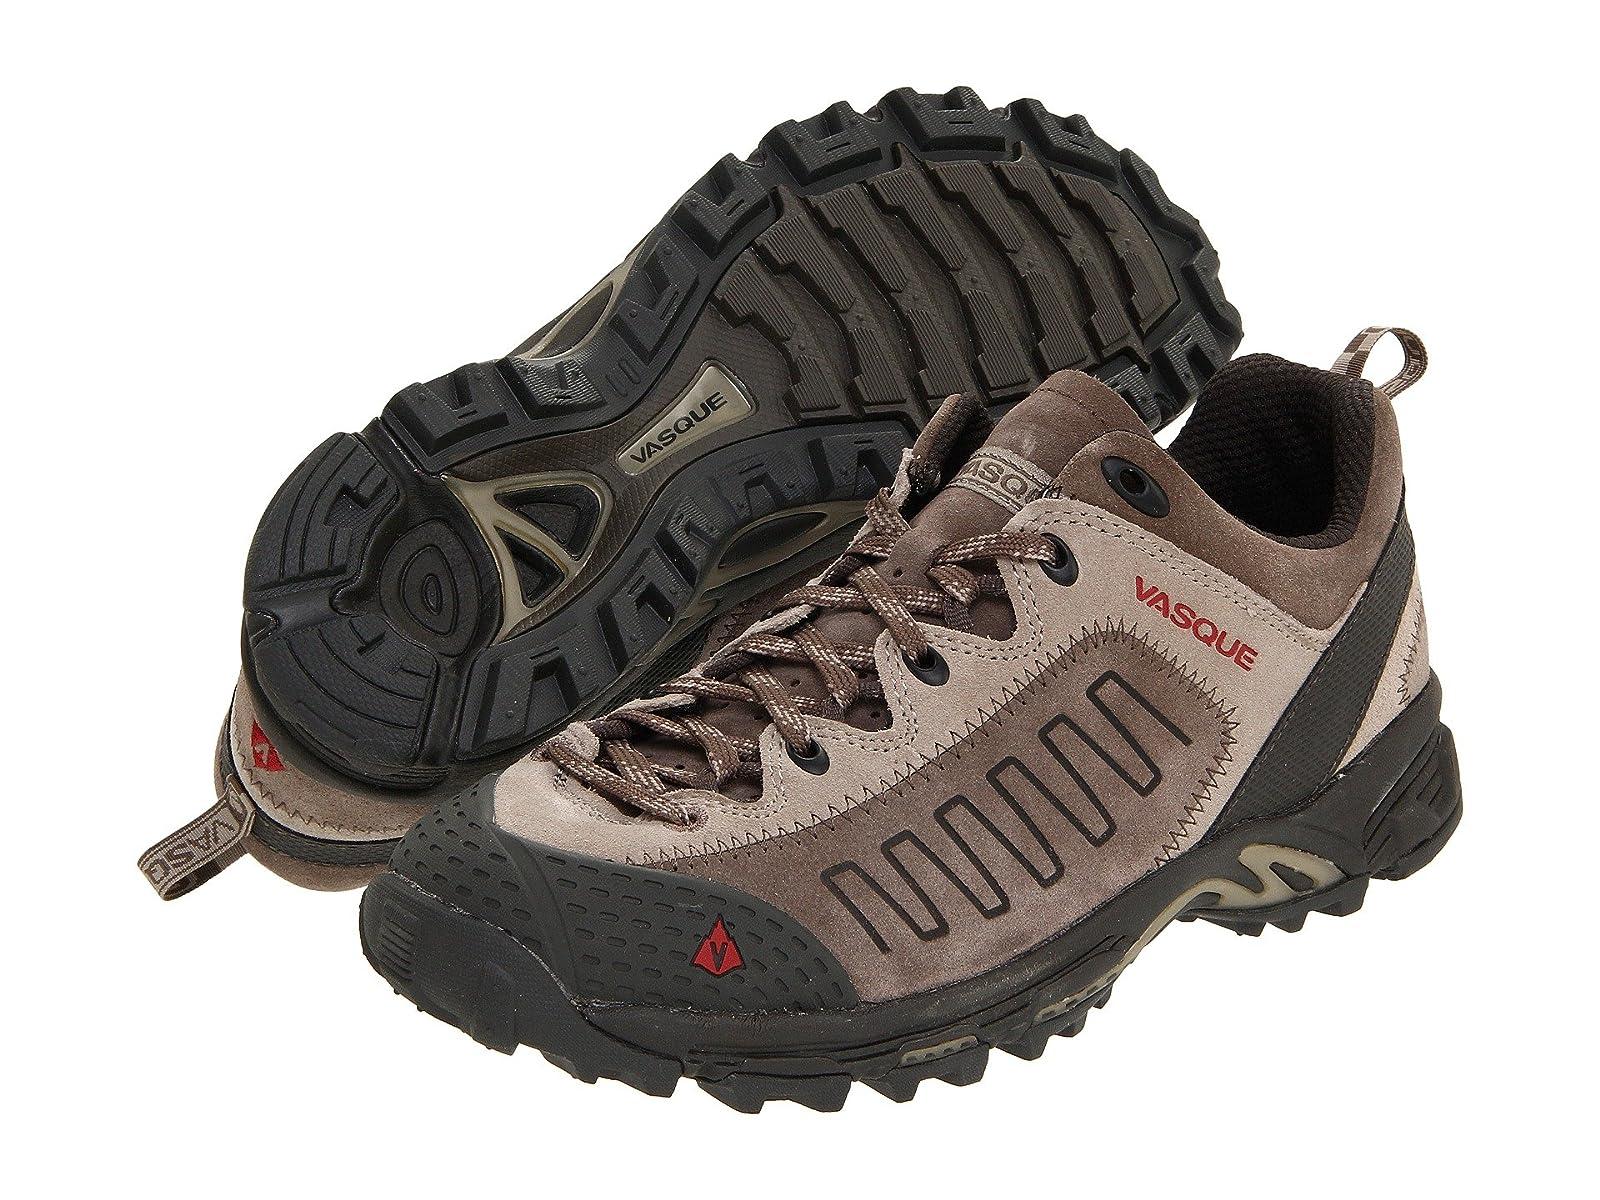 Vasque JuxtAtmospheric grades have affordable shoes